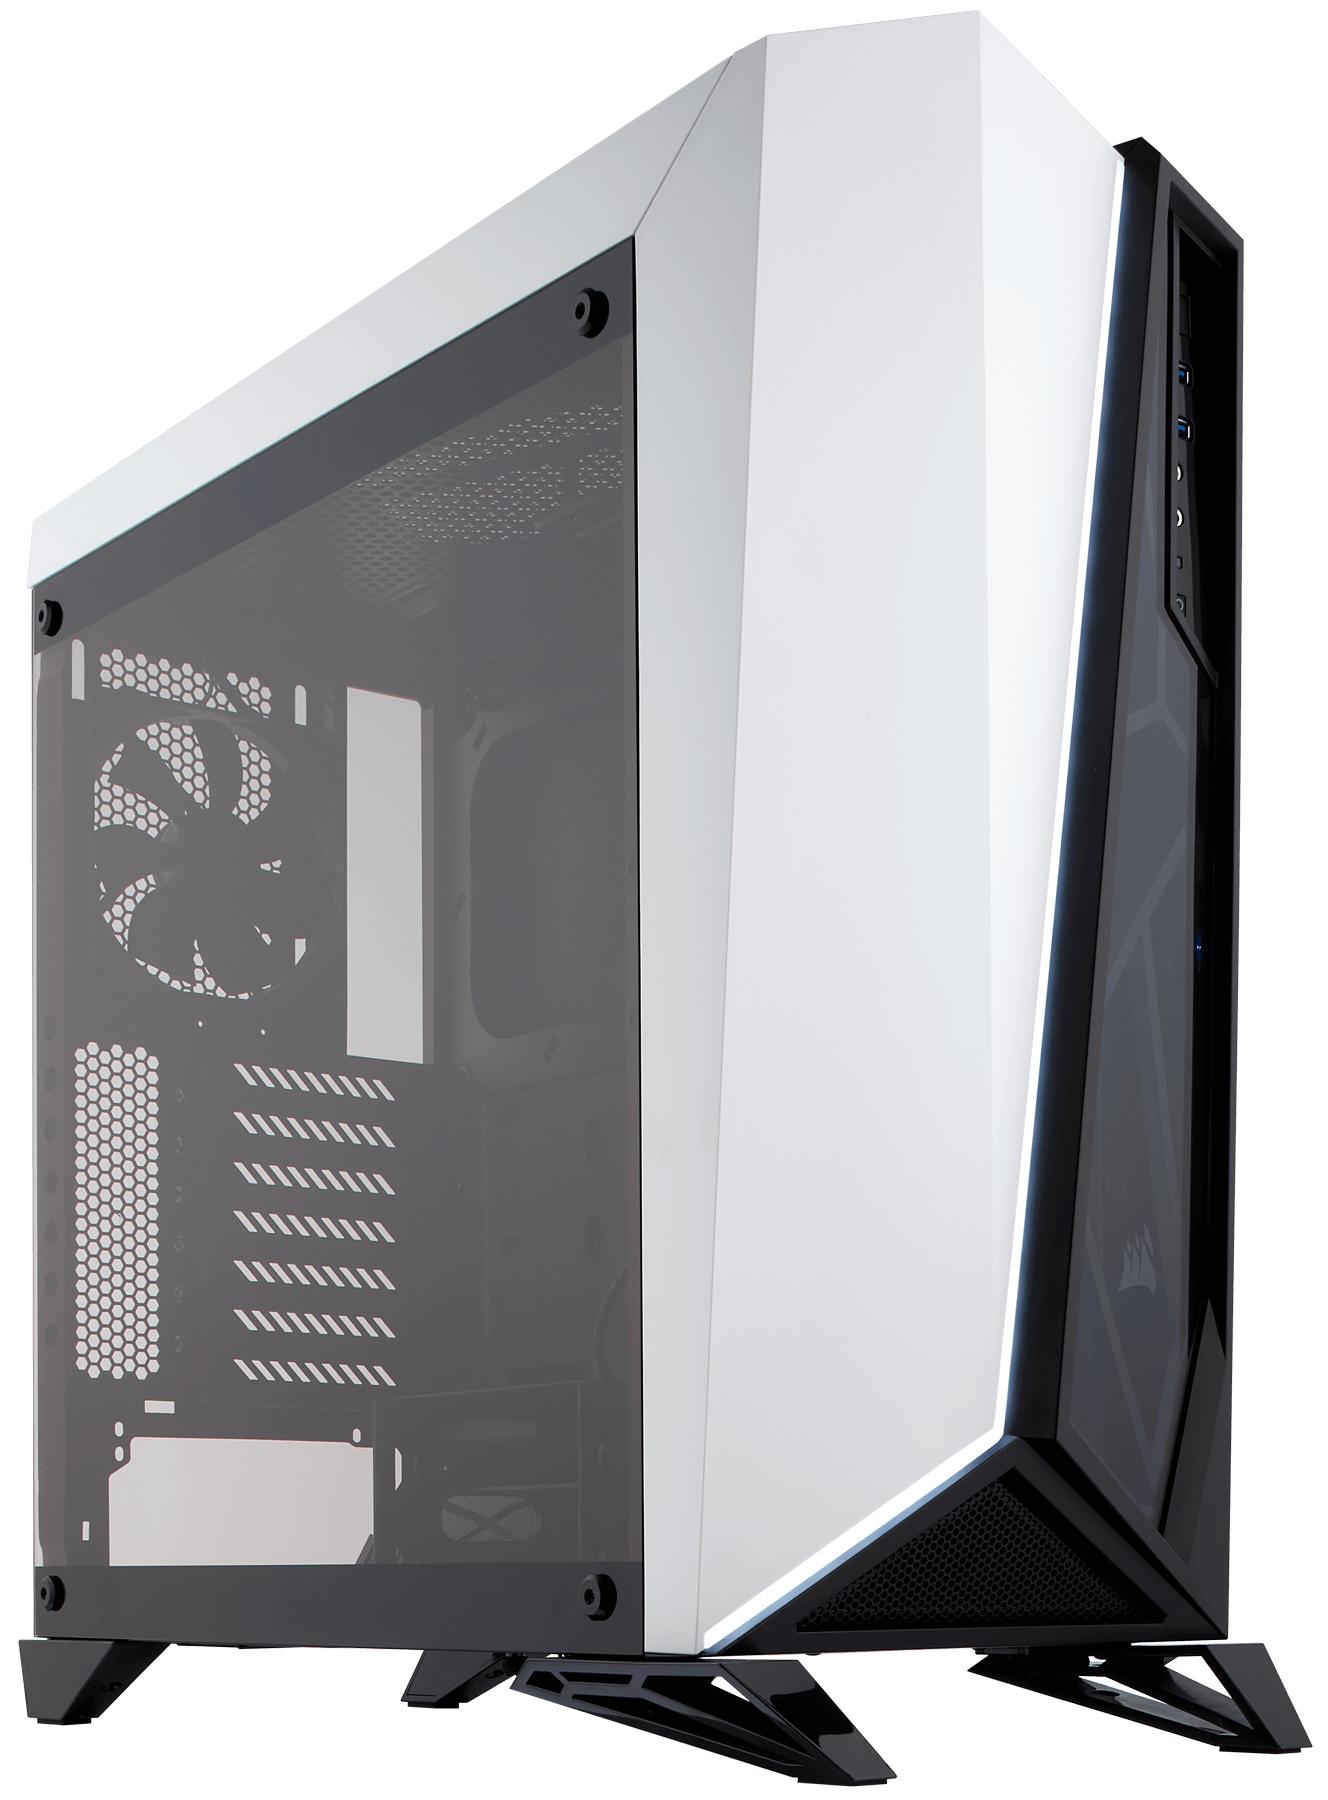 Corsair Carbide SPEC-OMEGA Midi-Tower Black, White computer case